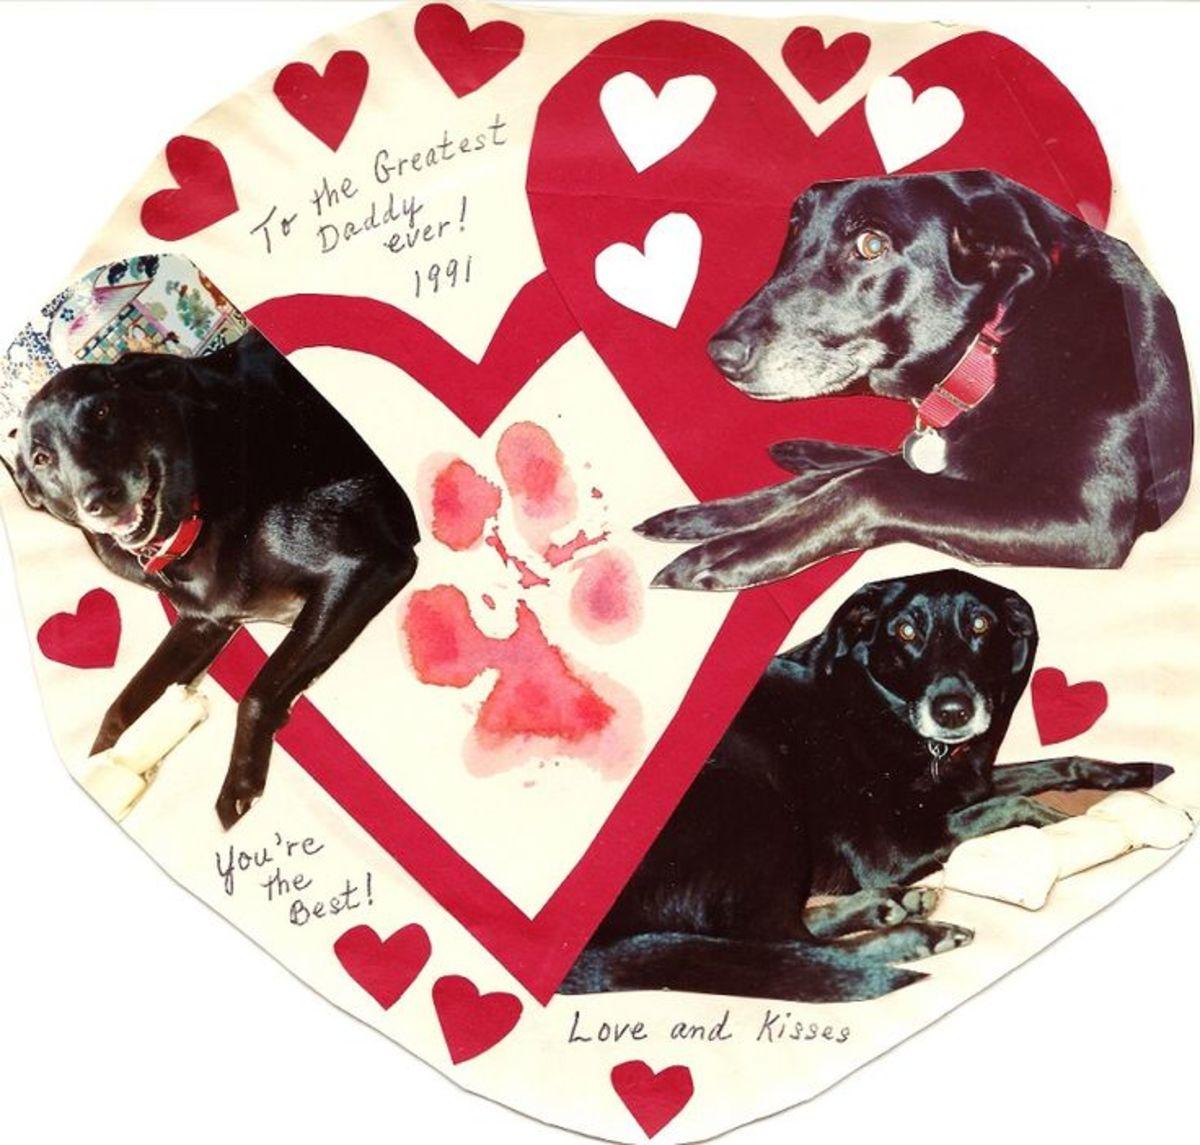 Trudy's Valentine Card with Paw Print